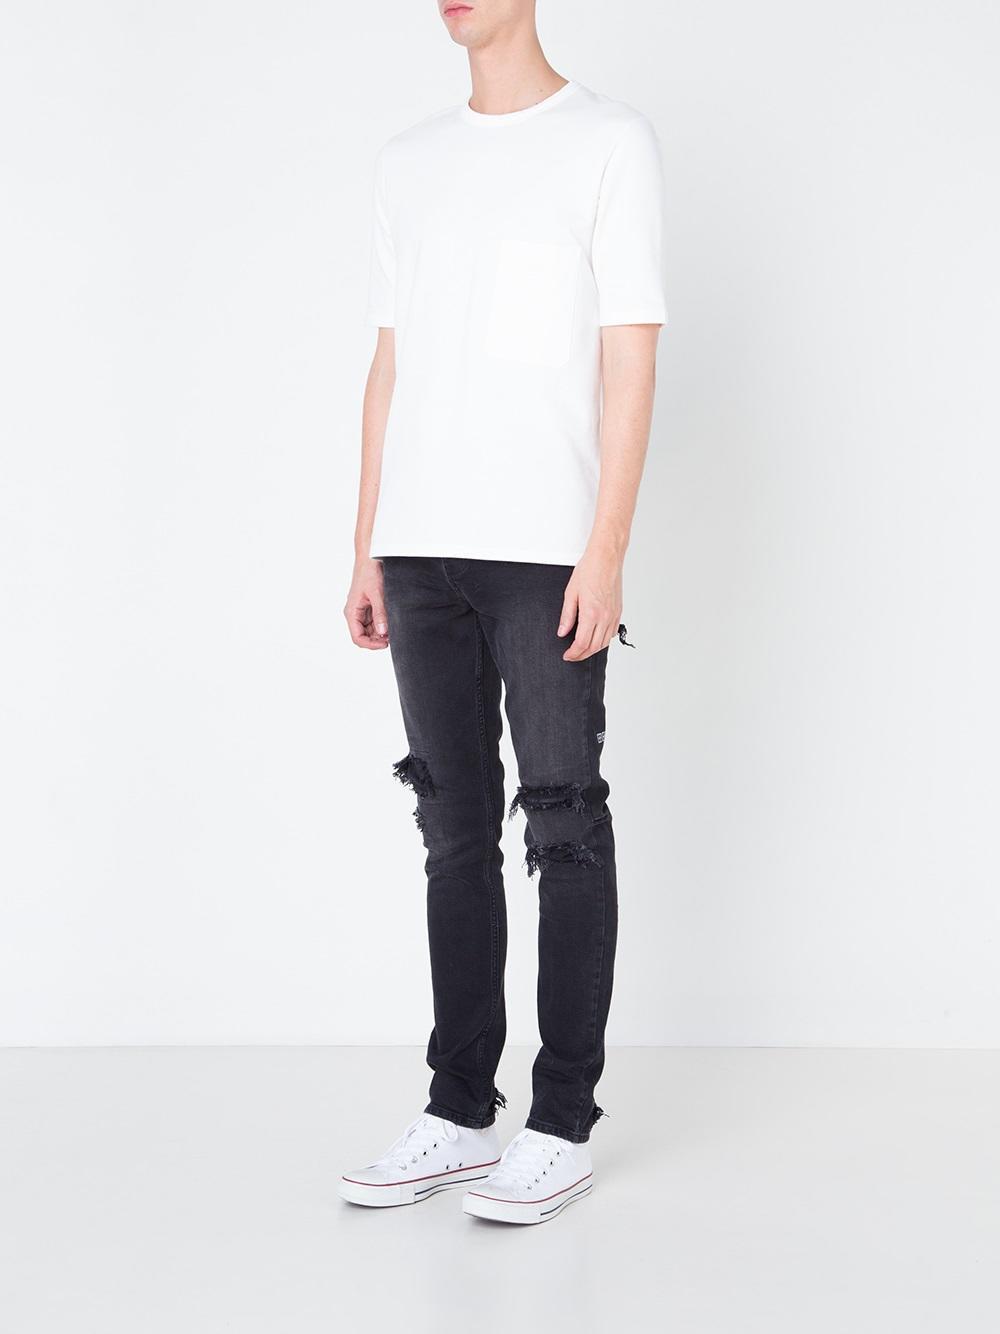 Ksubi Denim 'chitch Boneyard' Jeans in Black for Men